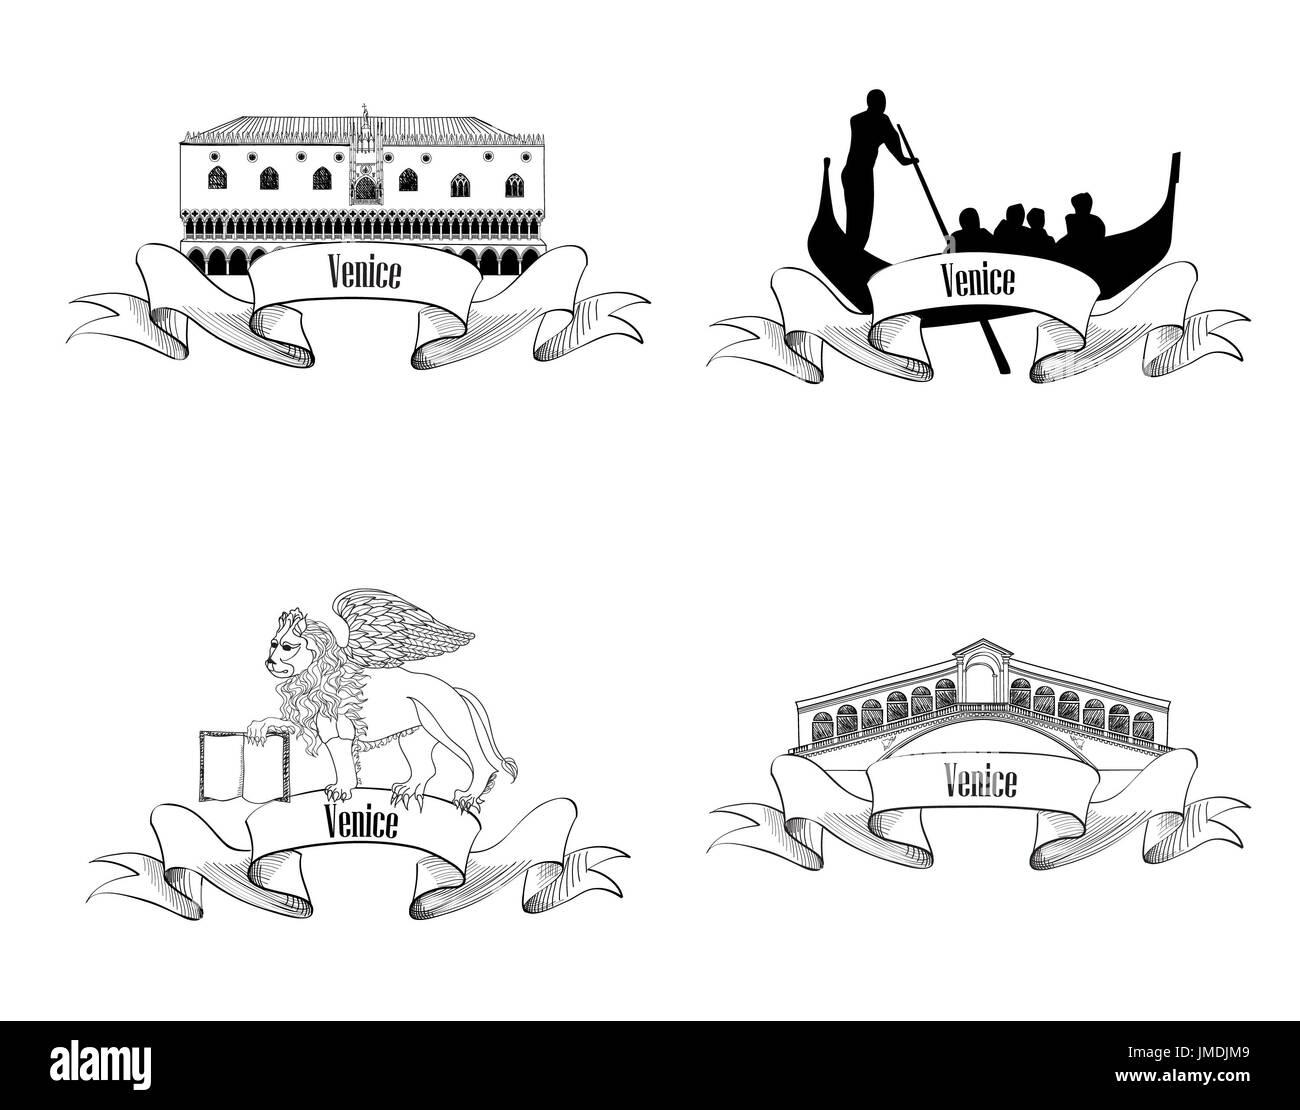 Venice symbol set. Gondola, Rialto Bridge, Doge palace, San Marco Lion. Venice landmarks. Travel Italy label sketch collection. City labels. - Stock Image